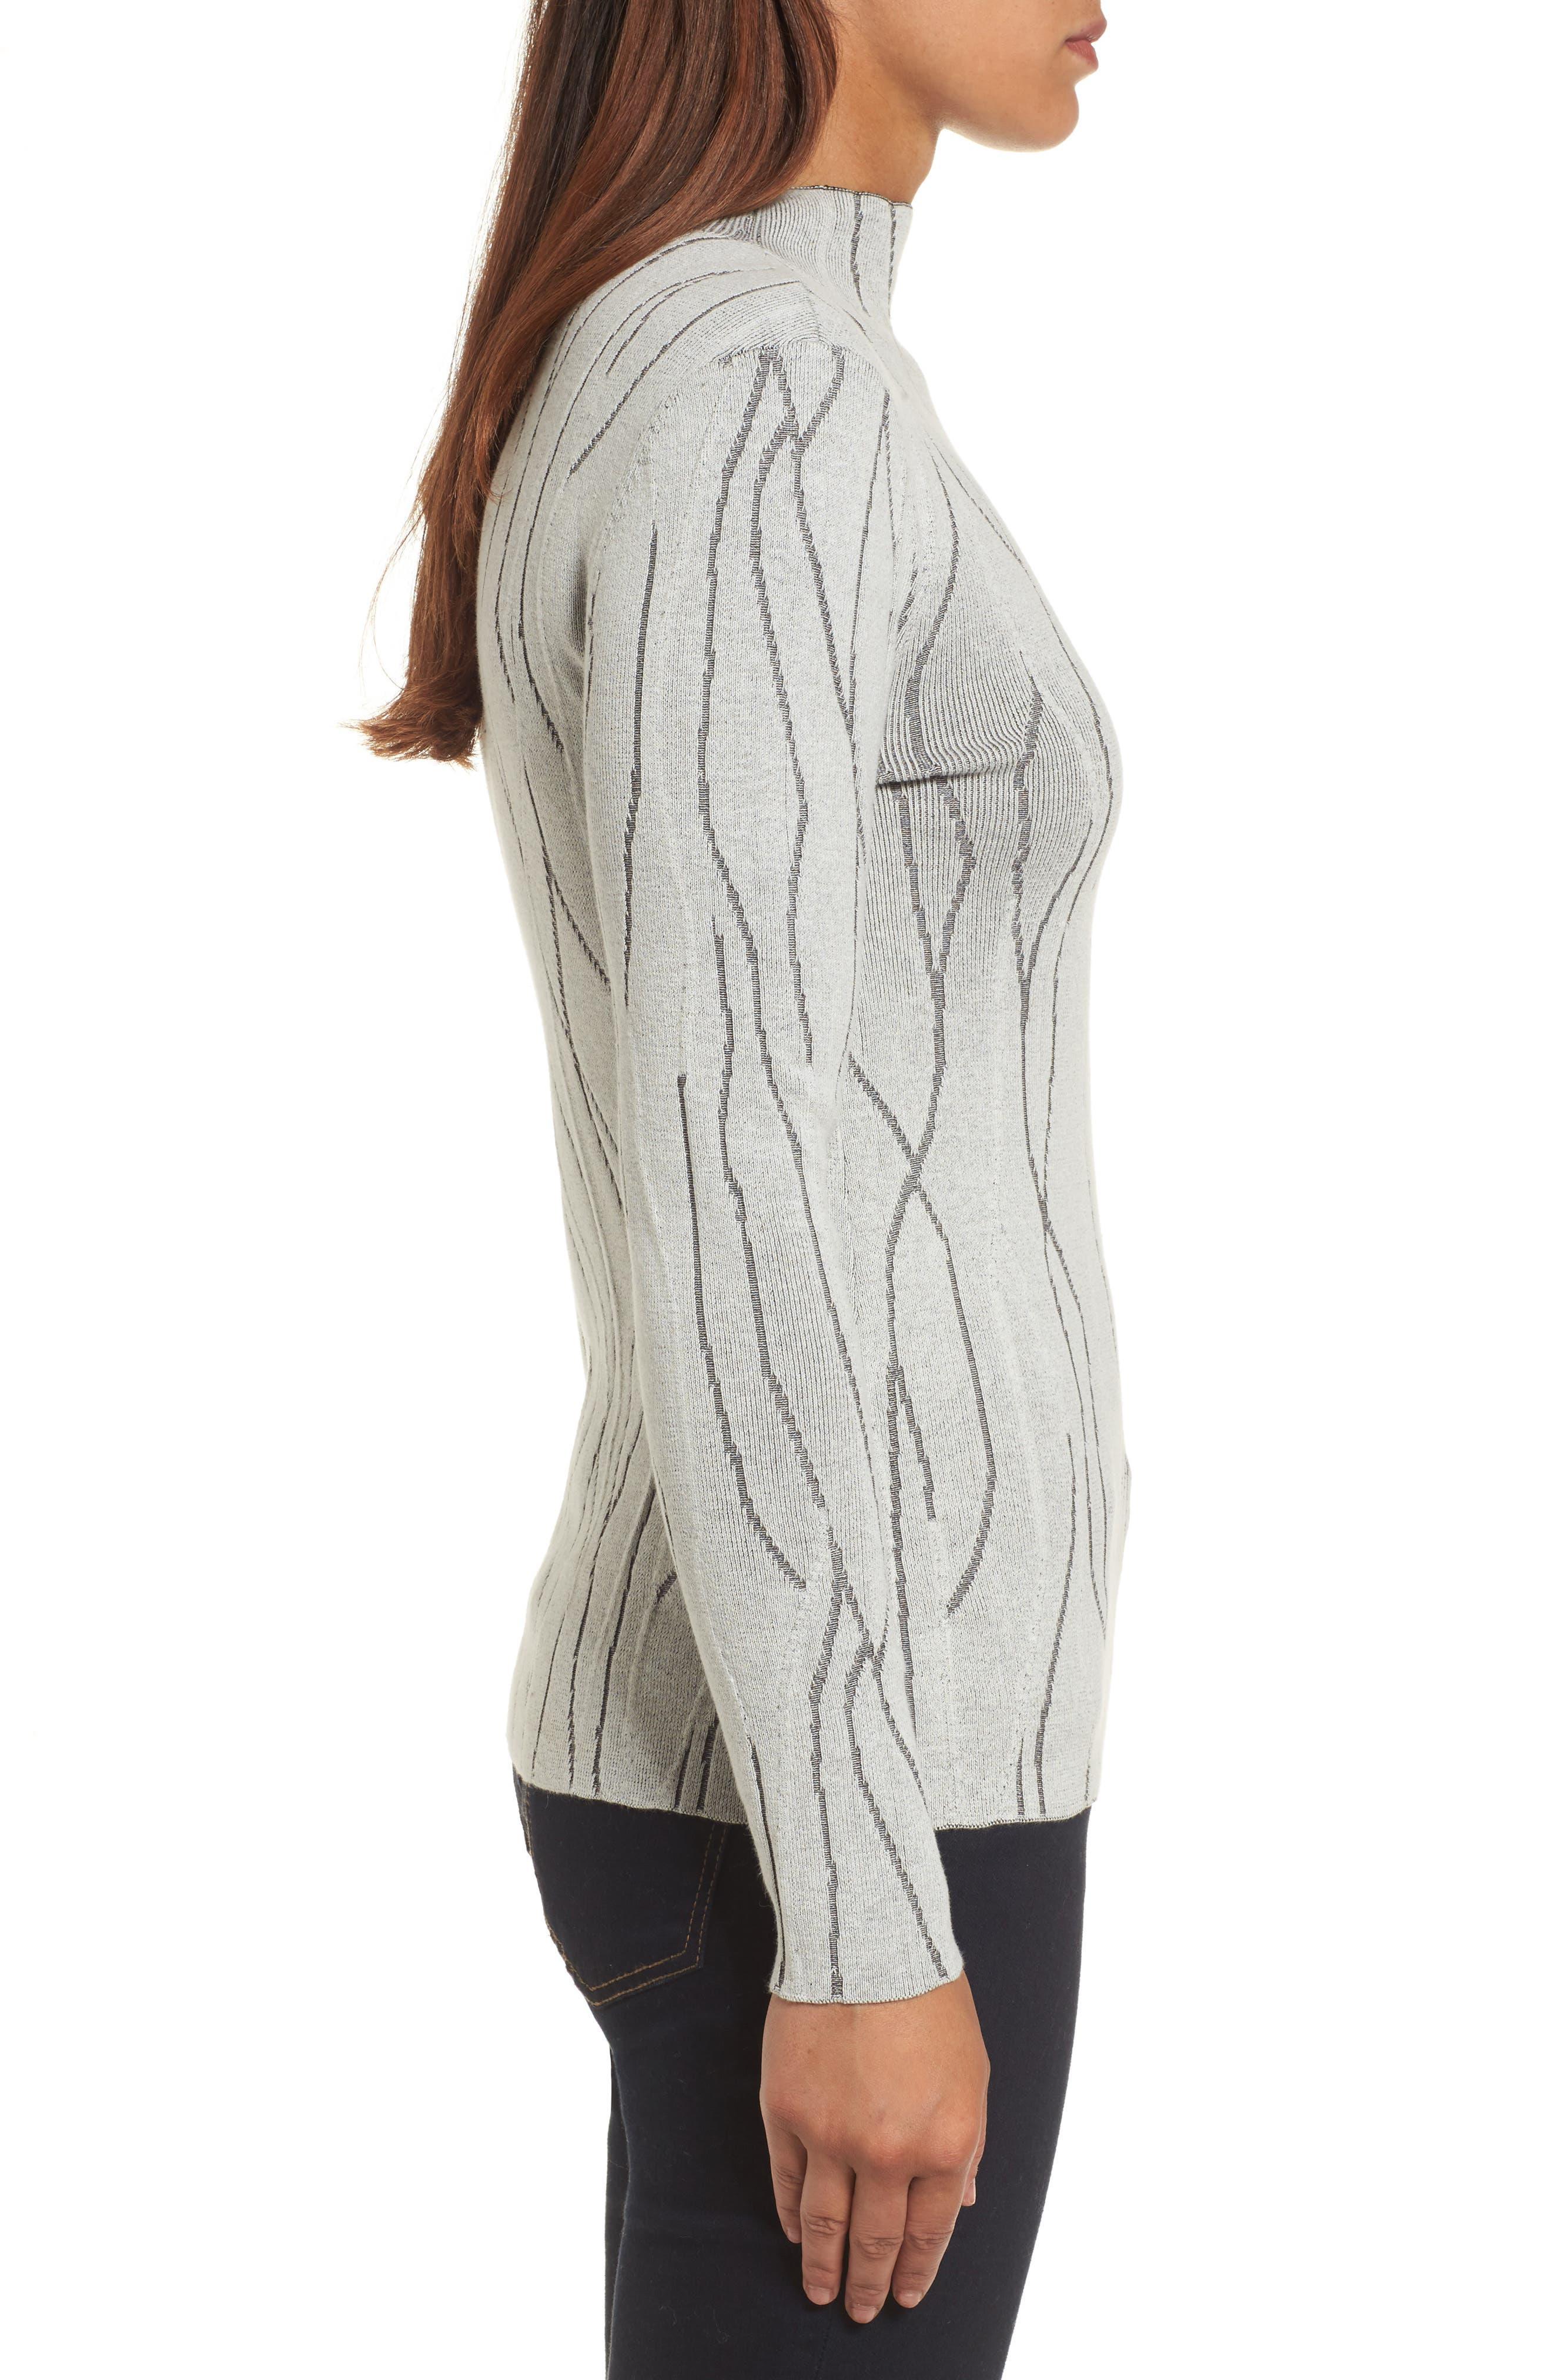 Artisanal Crackle Jacquard Sweater,                             Alternate thumbnail 3, color,                             Chalk